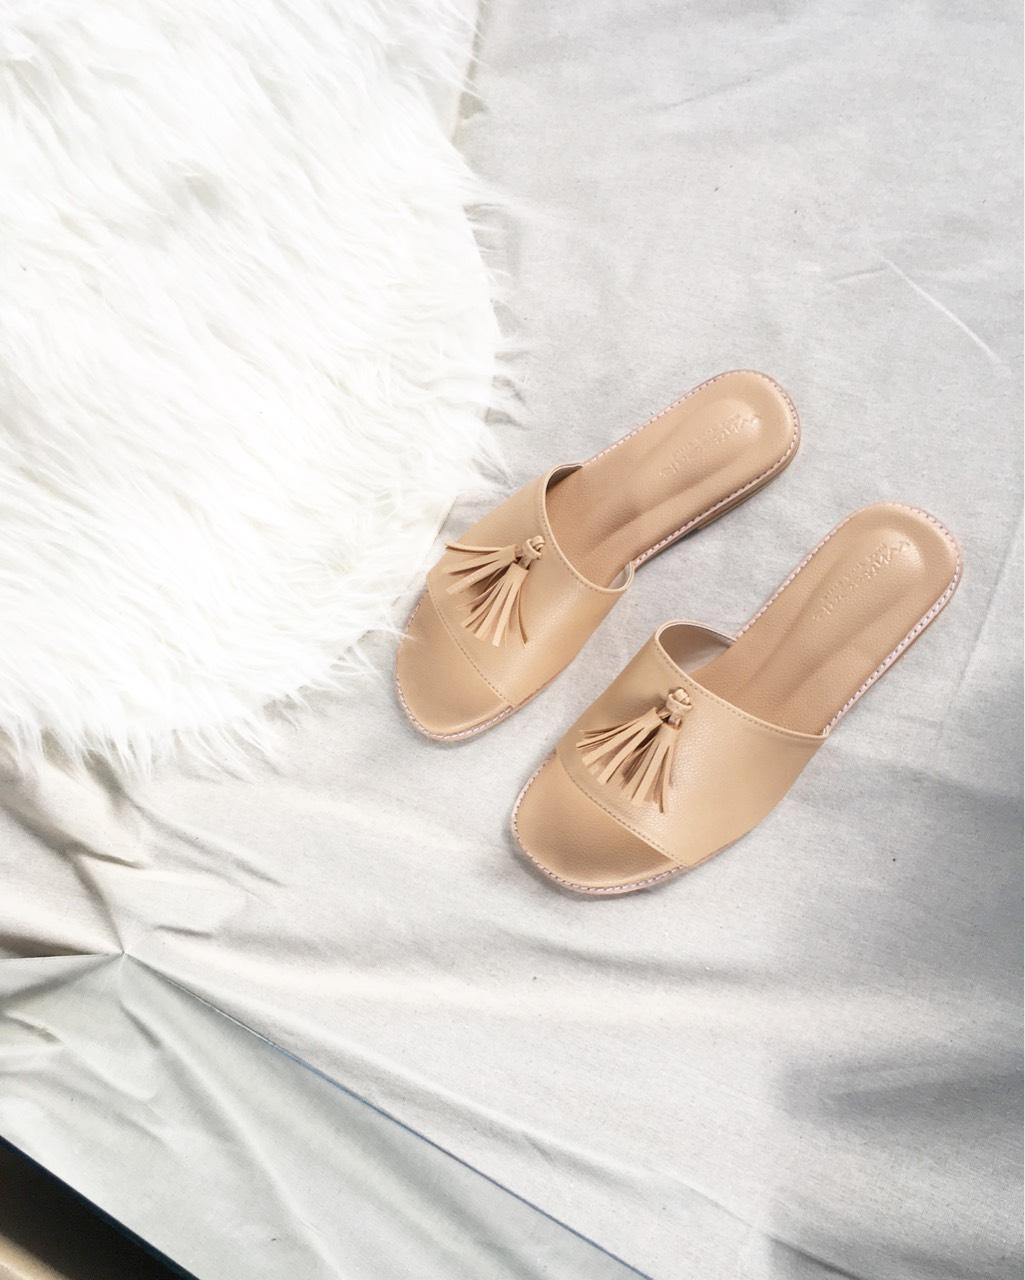 Whiteoakshoes,sandals,fashion,womenfashion,womenshoes,shoes,รองเท้าแตะ,รองเท้าแฟชั่น,รองเท้าแตะสวม,รองเท้าผู้หญิง,รองเท้านิ่ม